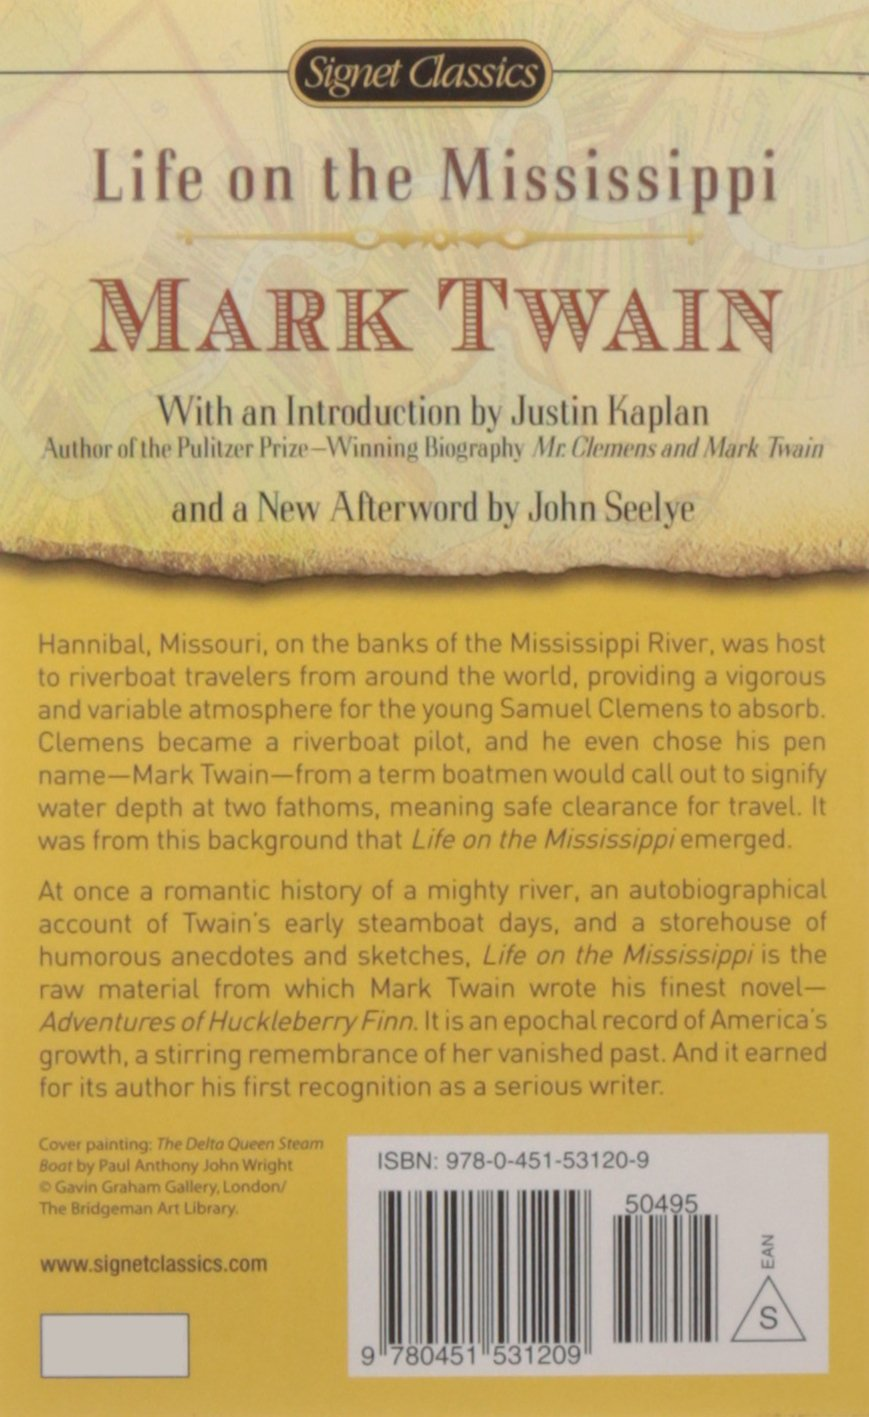 Life on the Mississippi (Signet Classics): Amazon.de: Mark Twain, John  Seelye, Justin Kaplan: Fremdsprachige Bücher